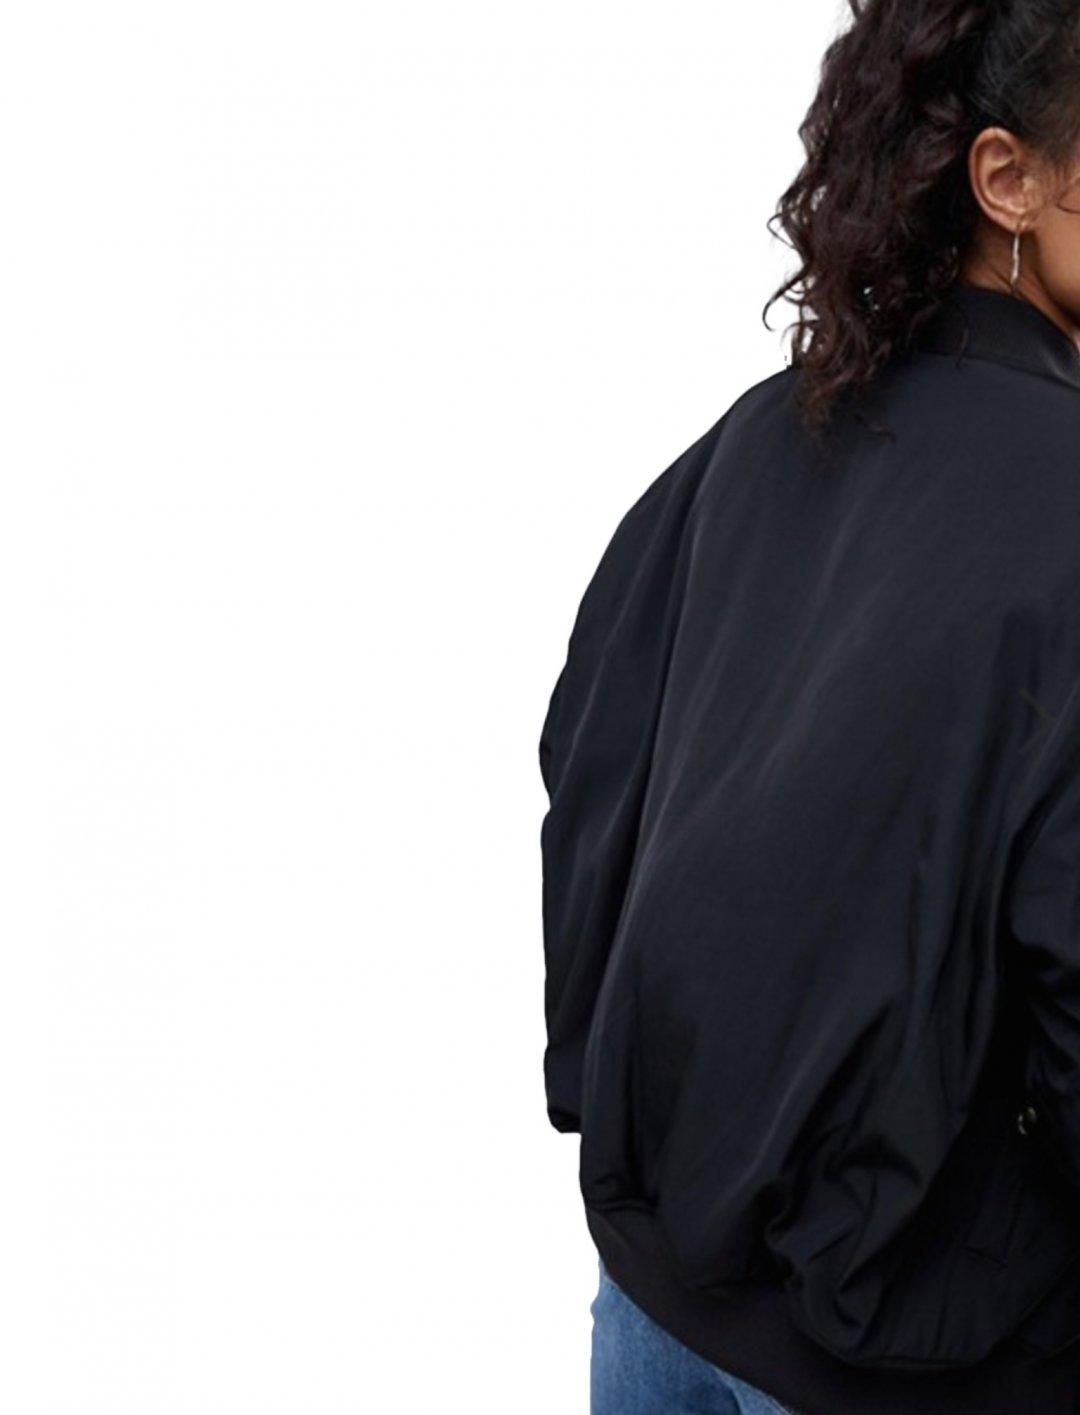 "Asos Oversized Bomber Jacket {""id"":5,""product_section_id"":1,""name"":""Clothing"",""order"":5} Asos"